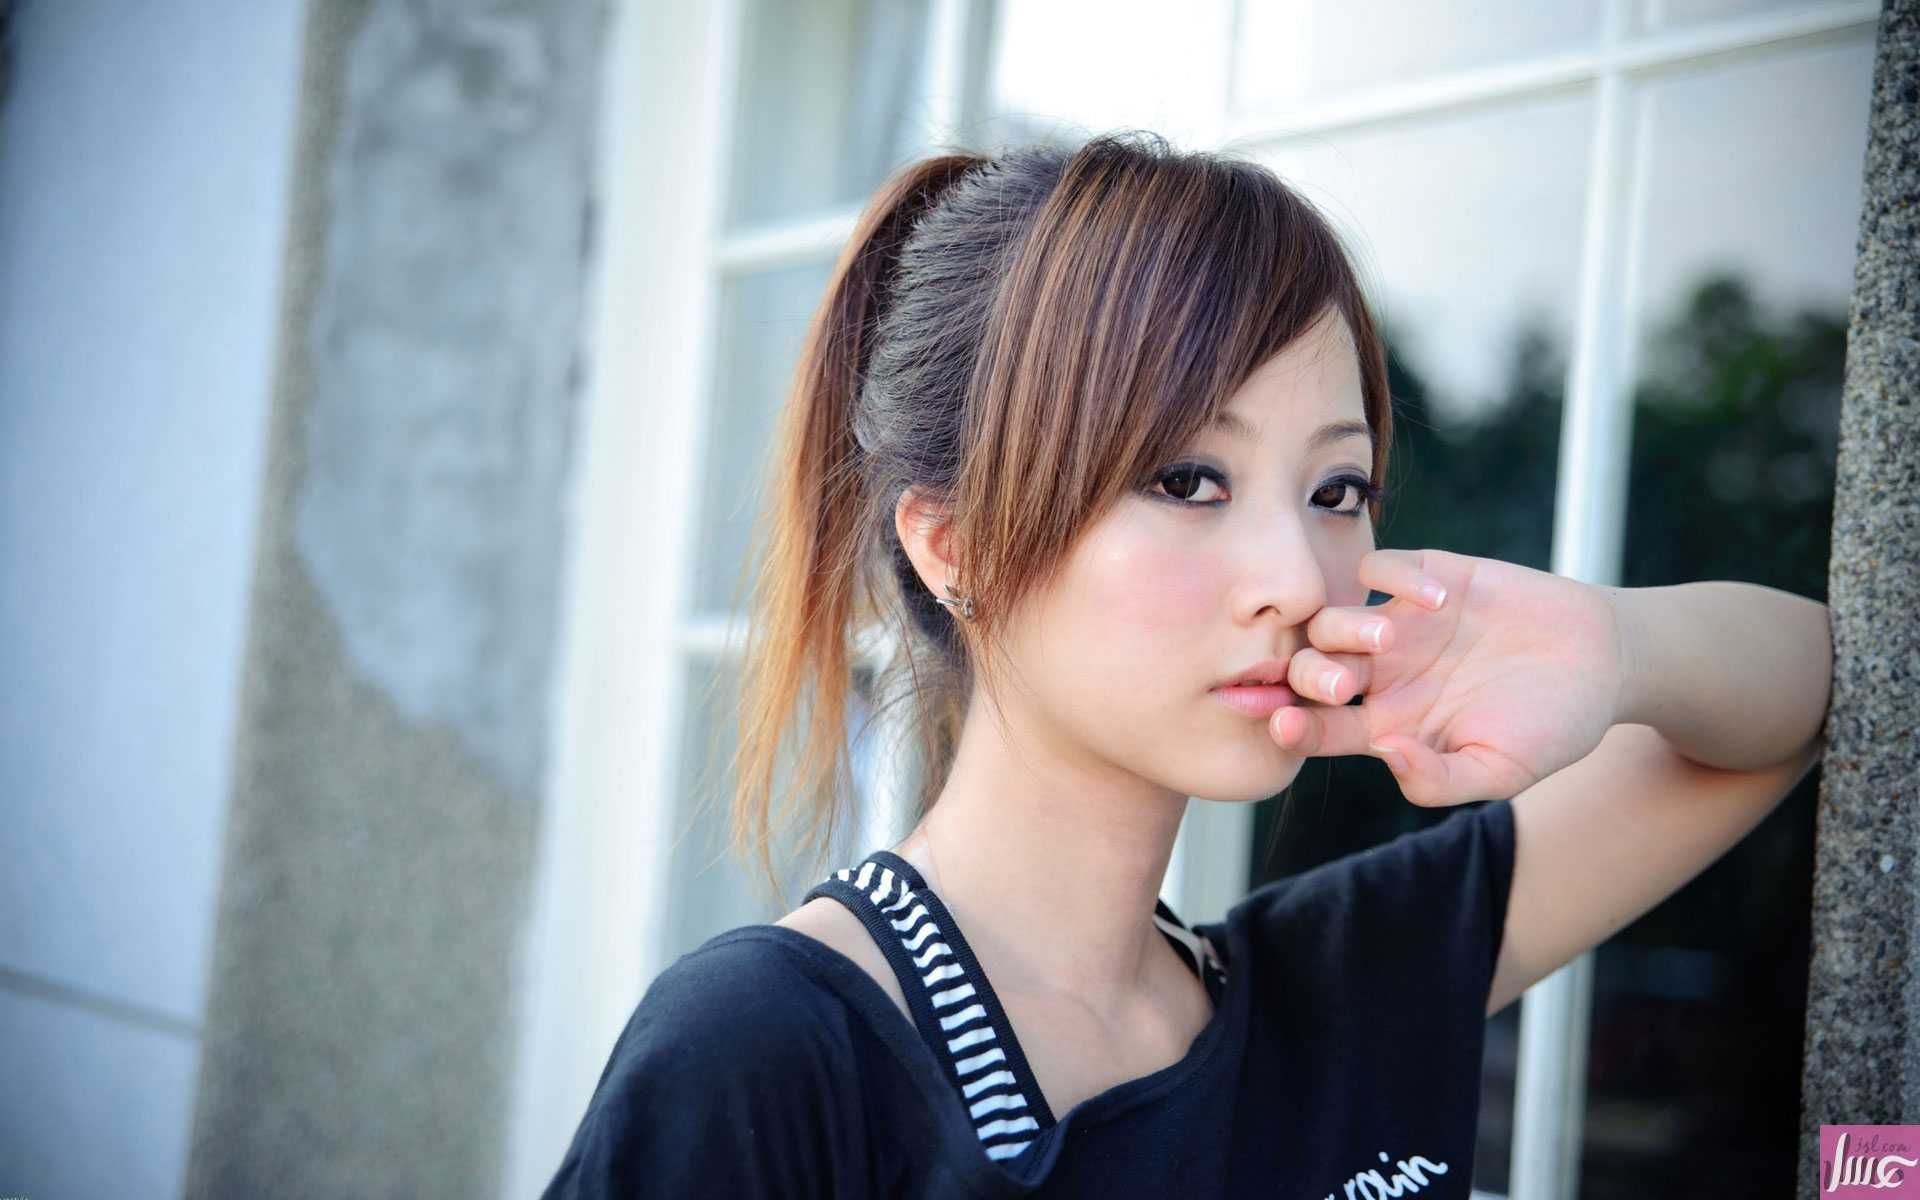 اسرار جاذبية البنات , اغراء بنات | chat , picture ,video, games,شات